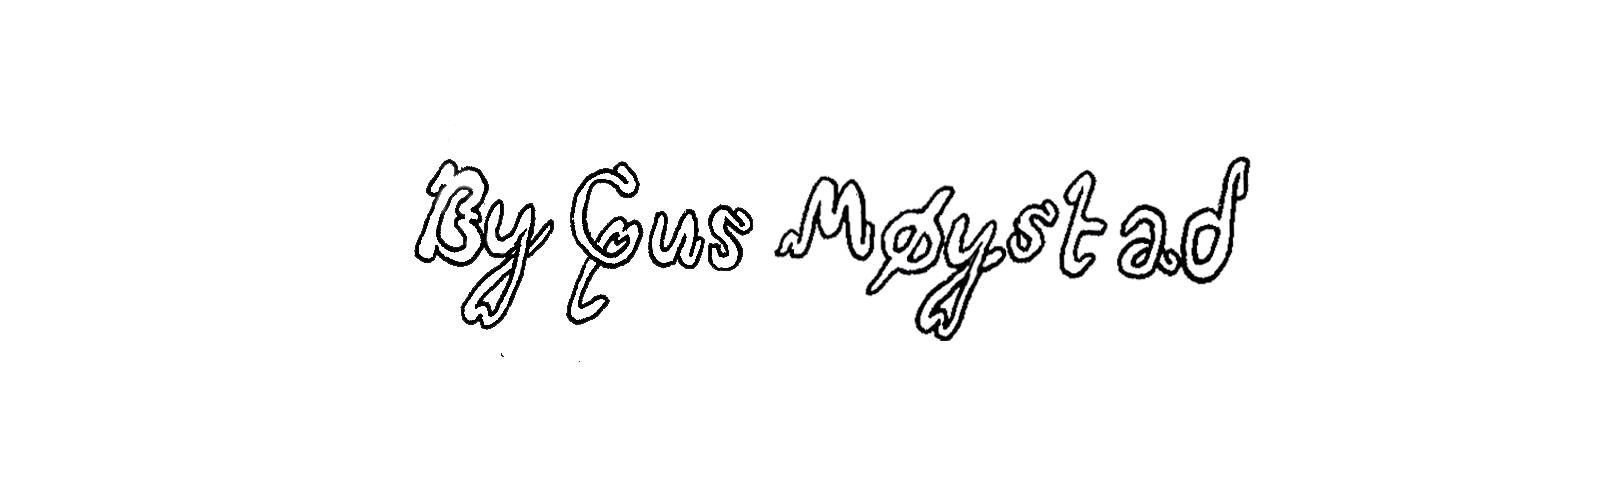 Website-titles-Gus-Moystad.png